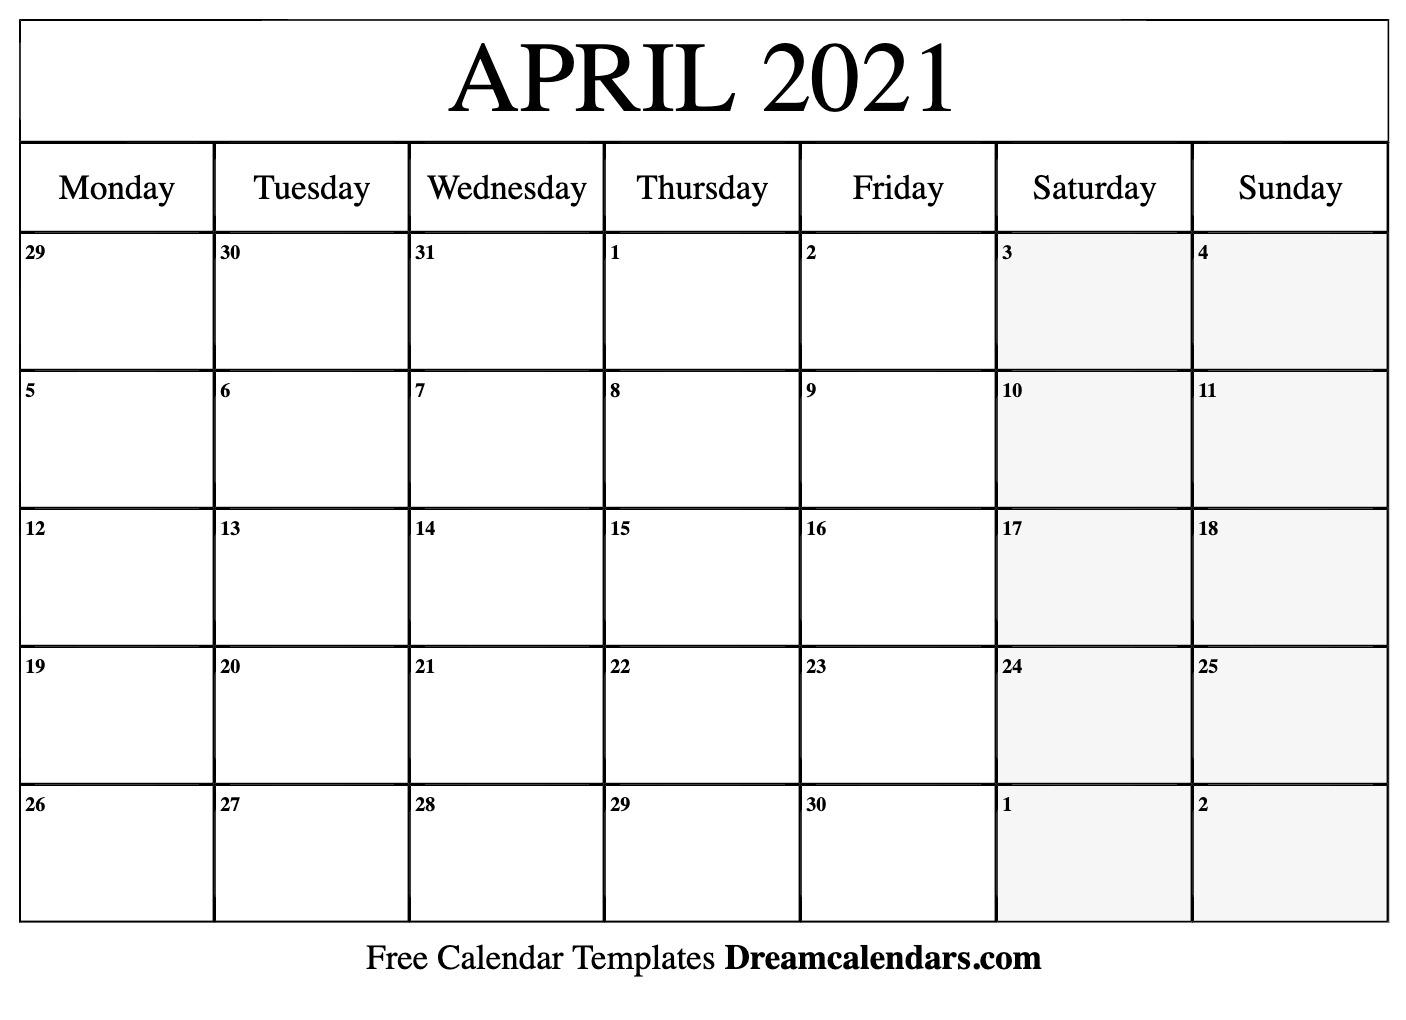 April 2021 Calendar | Free Blank Printable Templates